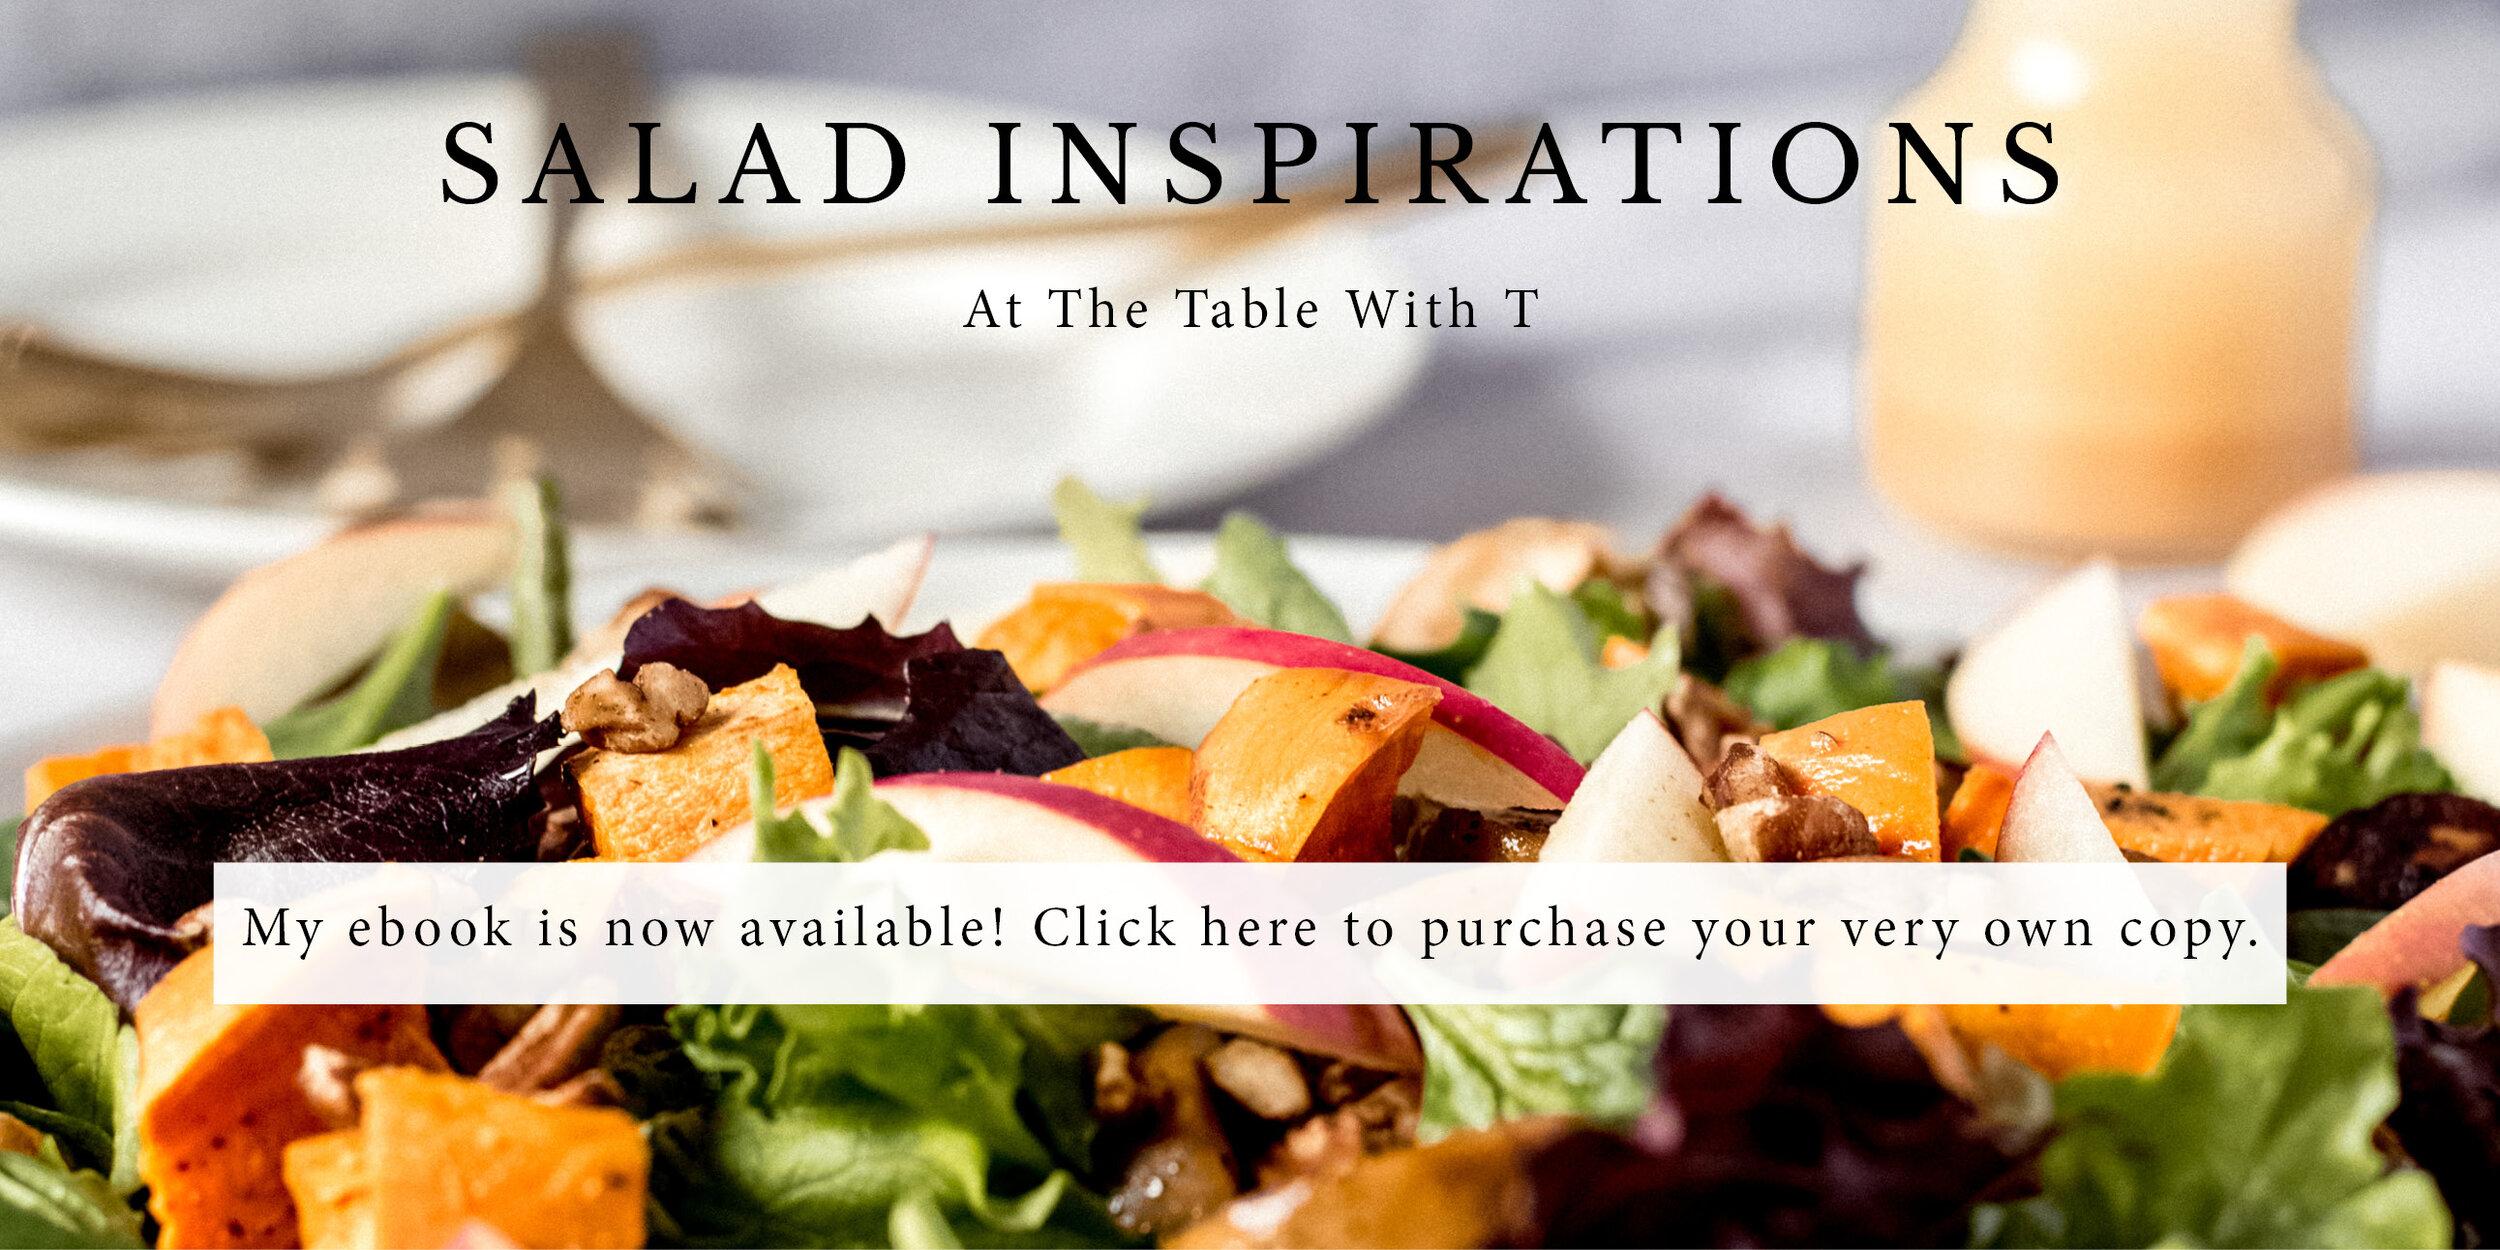 salad inspirations ad.jpg